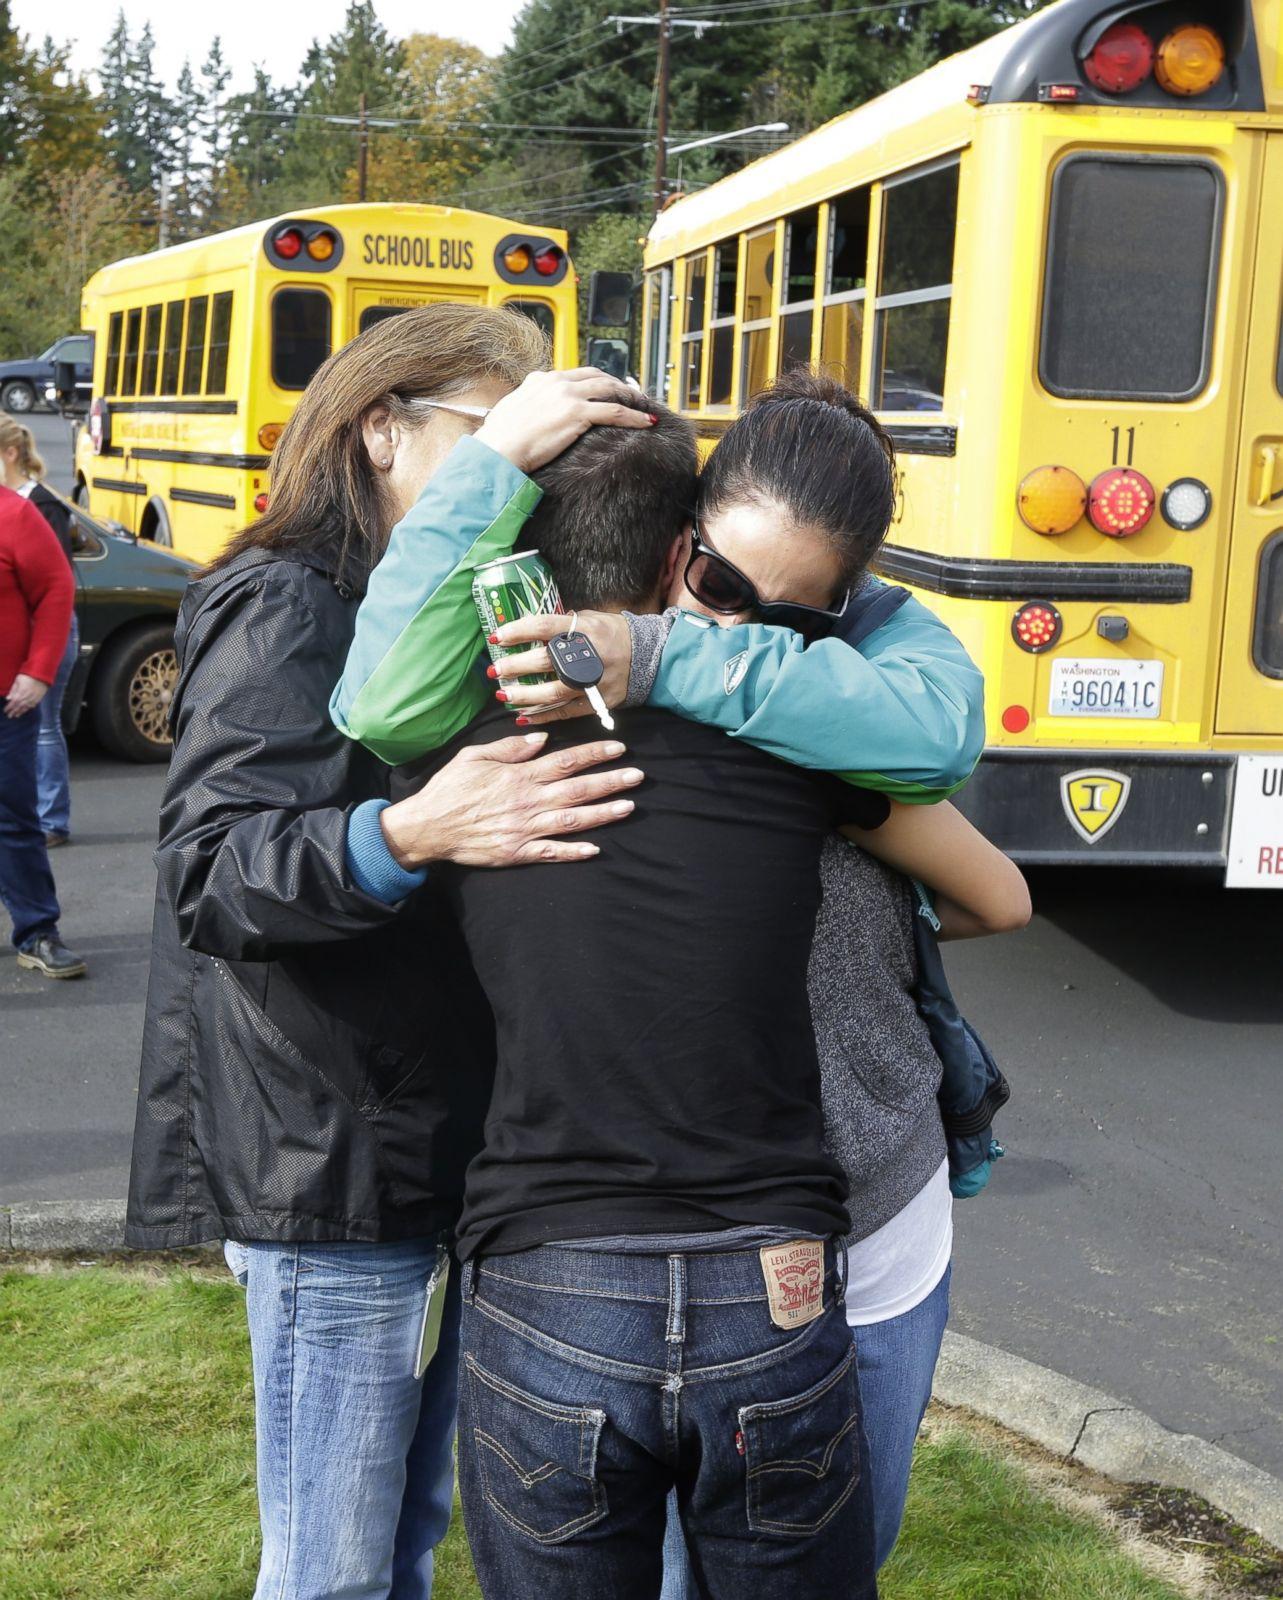 Washington High School Shooting Photos